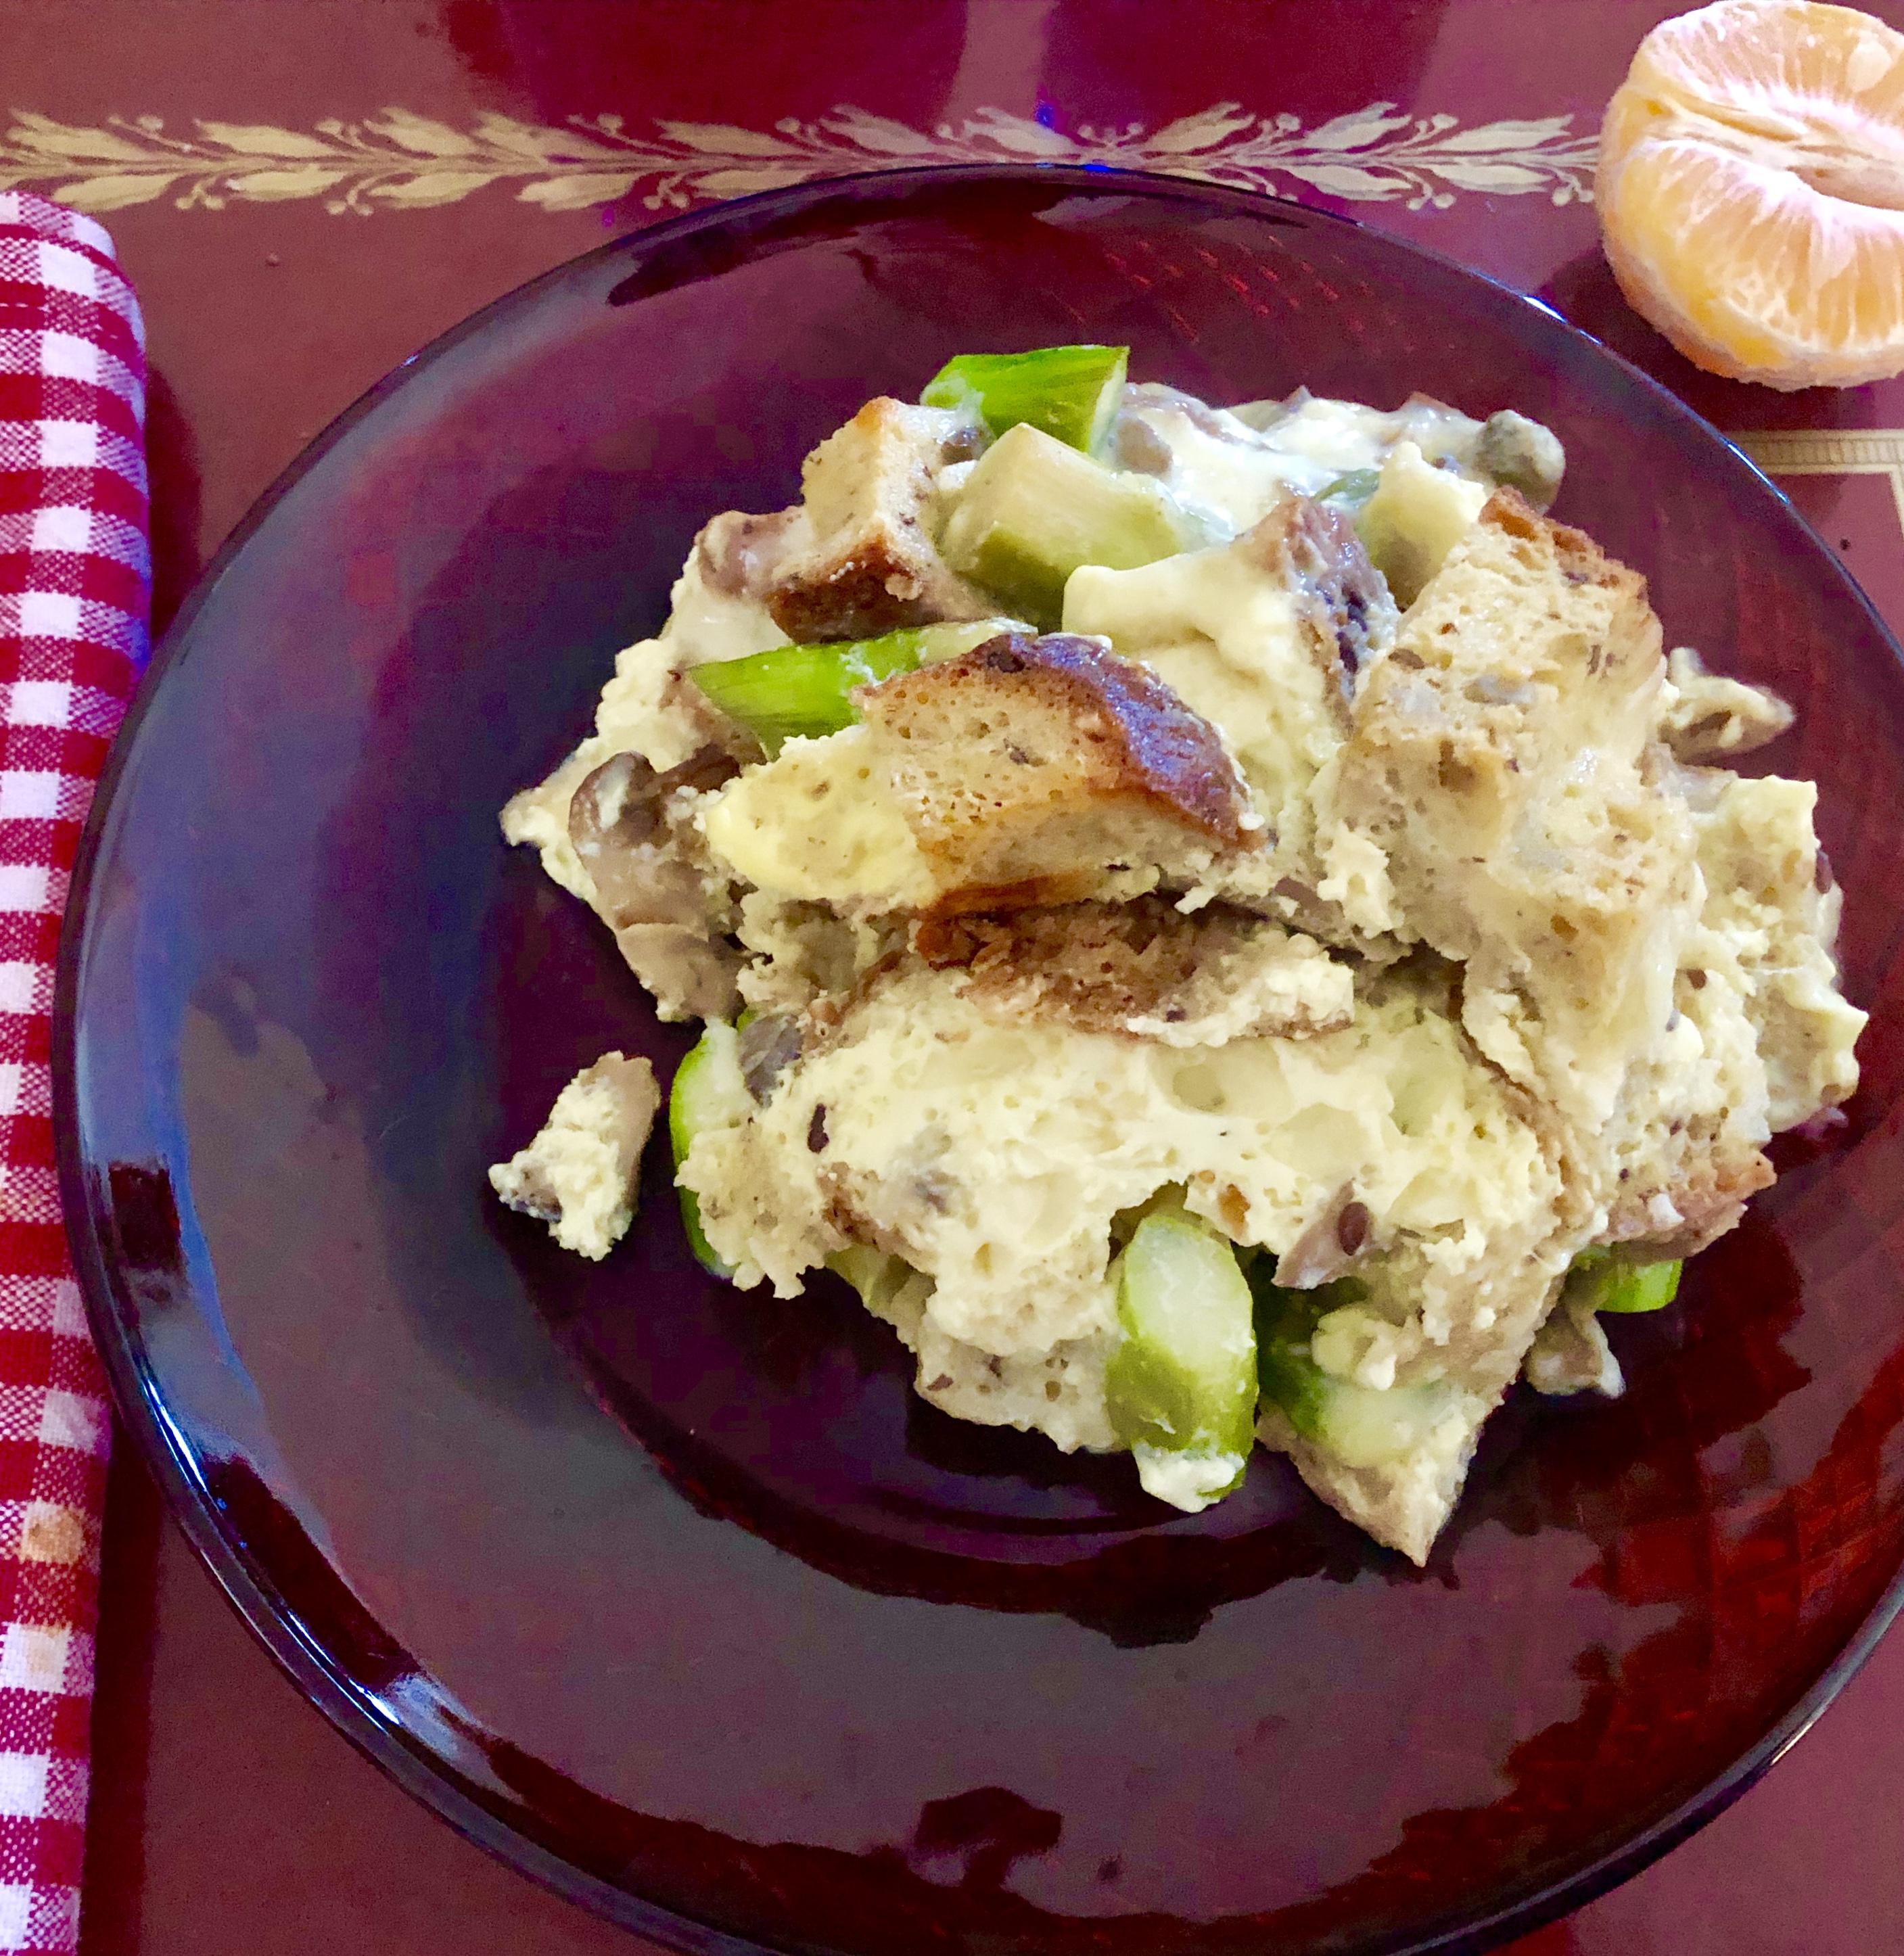 Asparagus Mushroom Dijon Strata from Alexandersmom.com